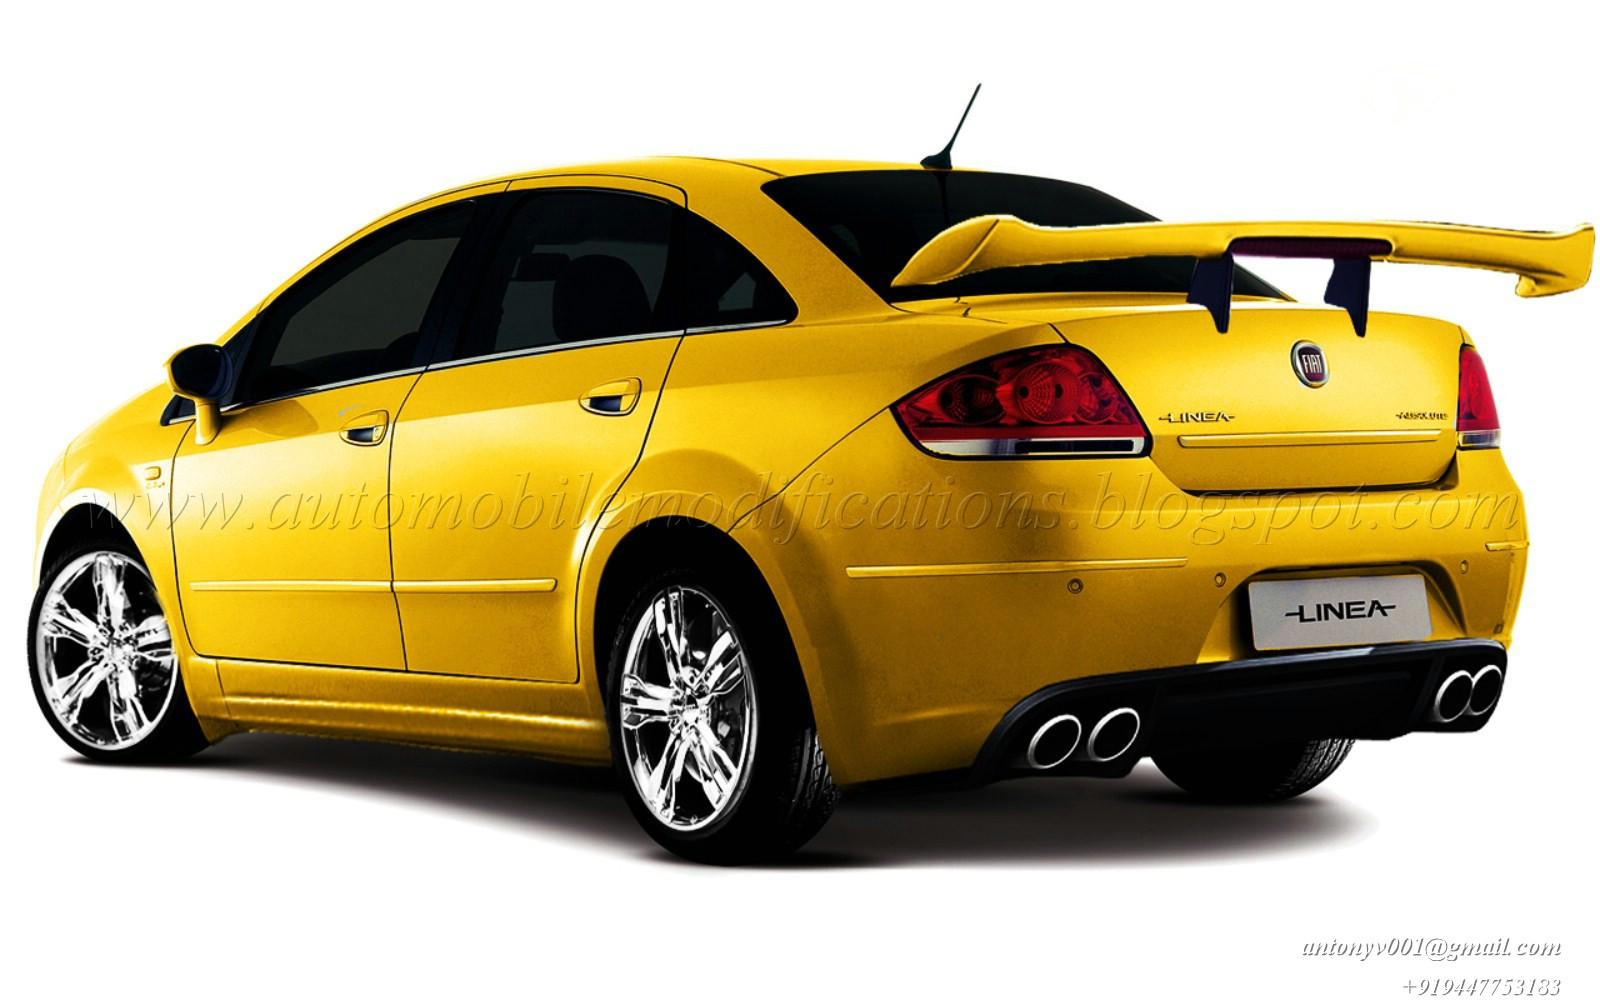 AUTOMOBILE MODIFICATIONS: FIAT LINEA HEAVILY MODIFIED